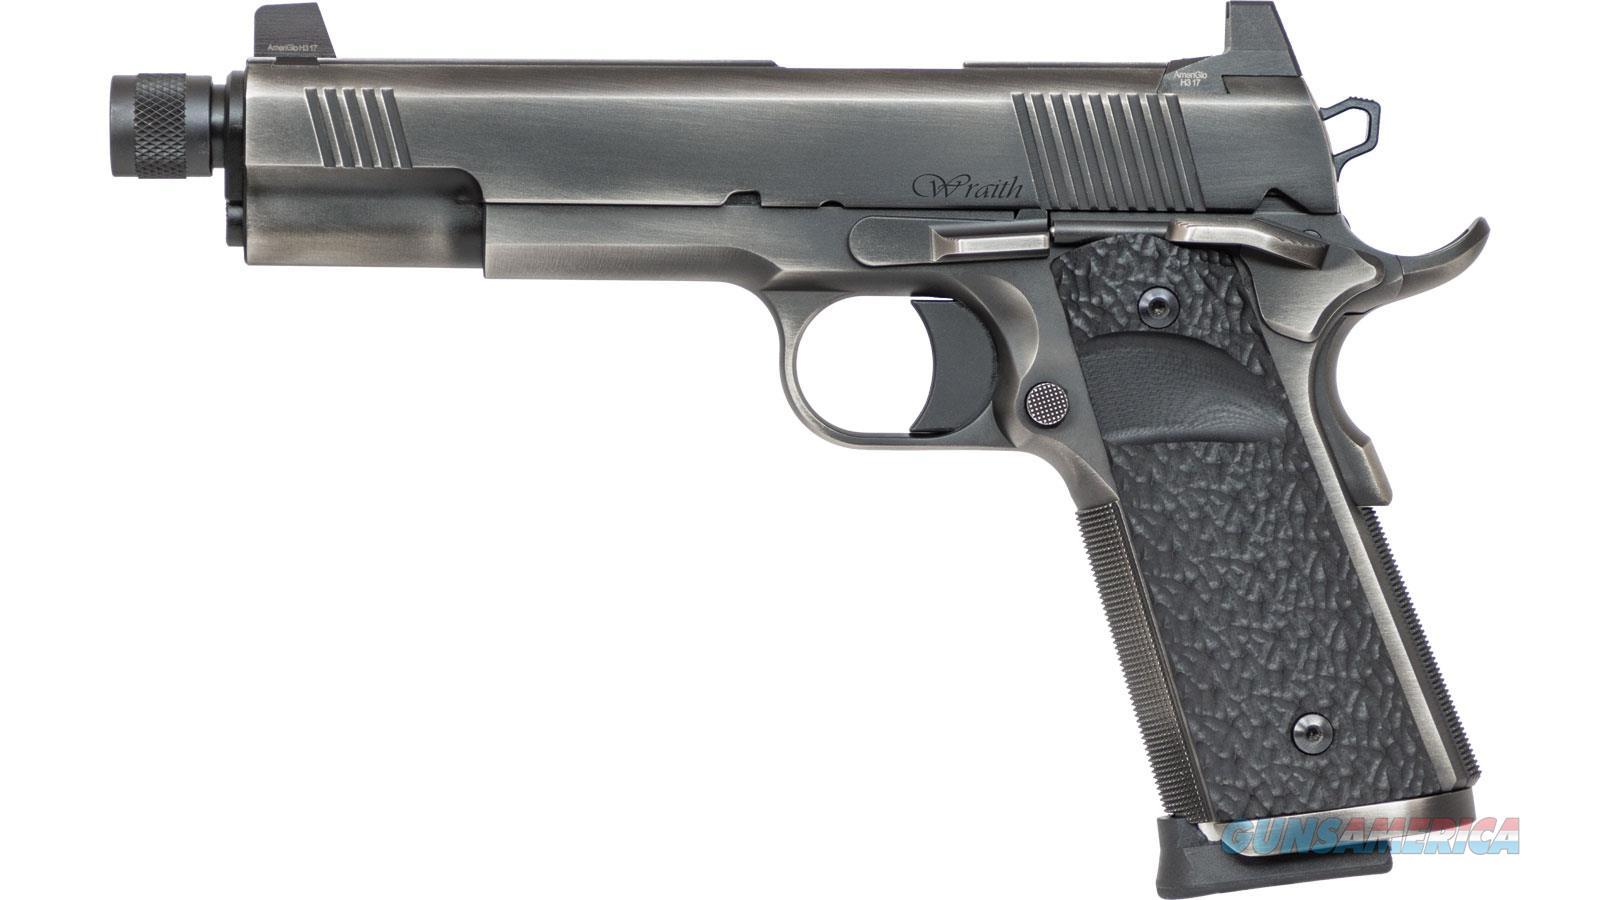 Czusa Dw Wraith Suppressor Ready 01849  Guns > Pistols > C Misc Pistols